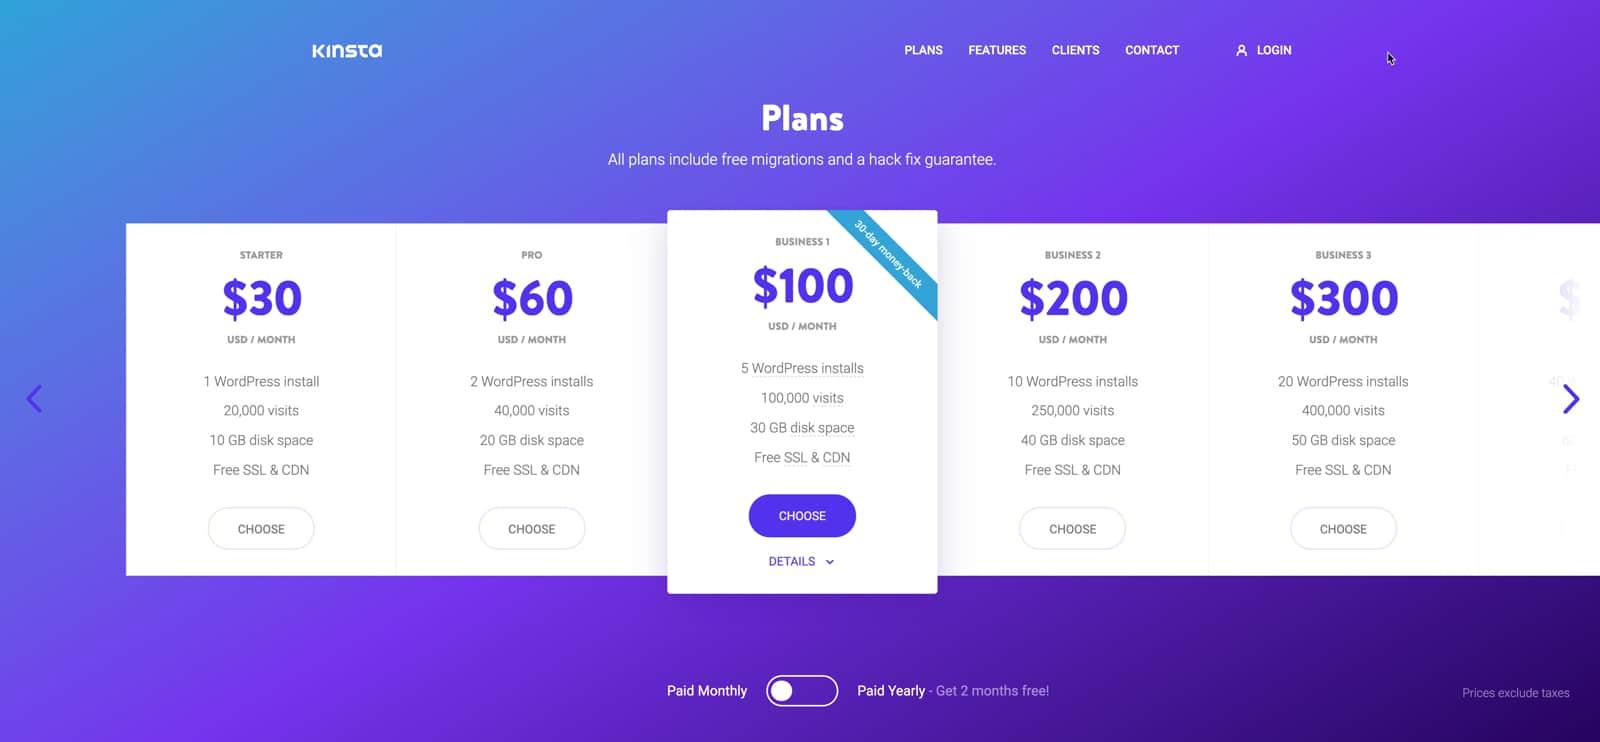 kinsta pricing plans